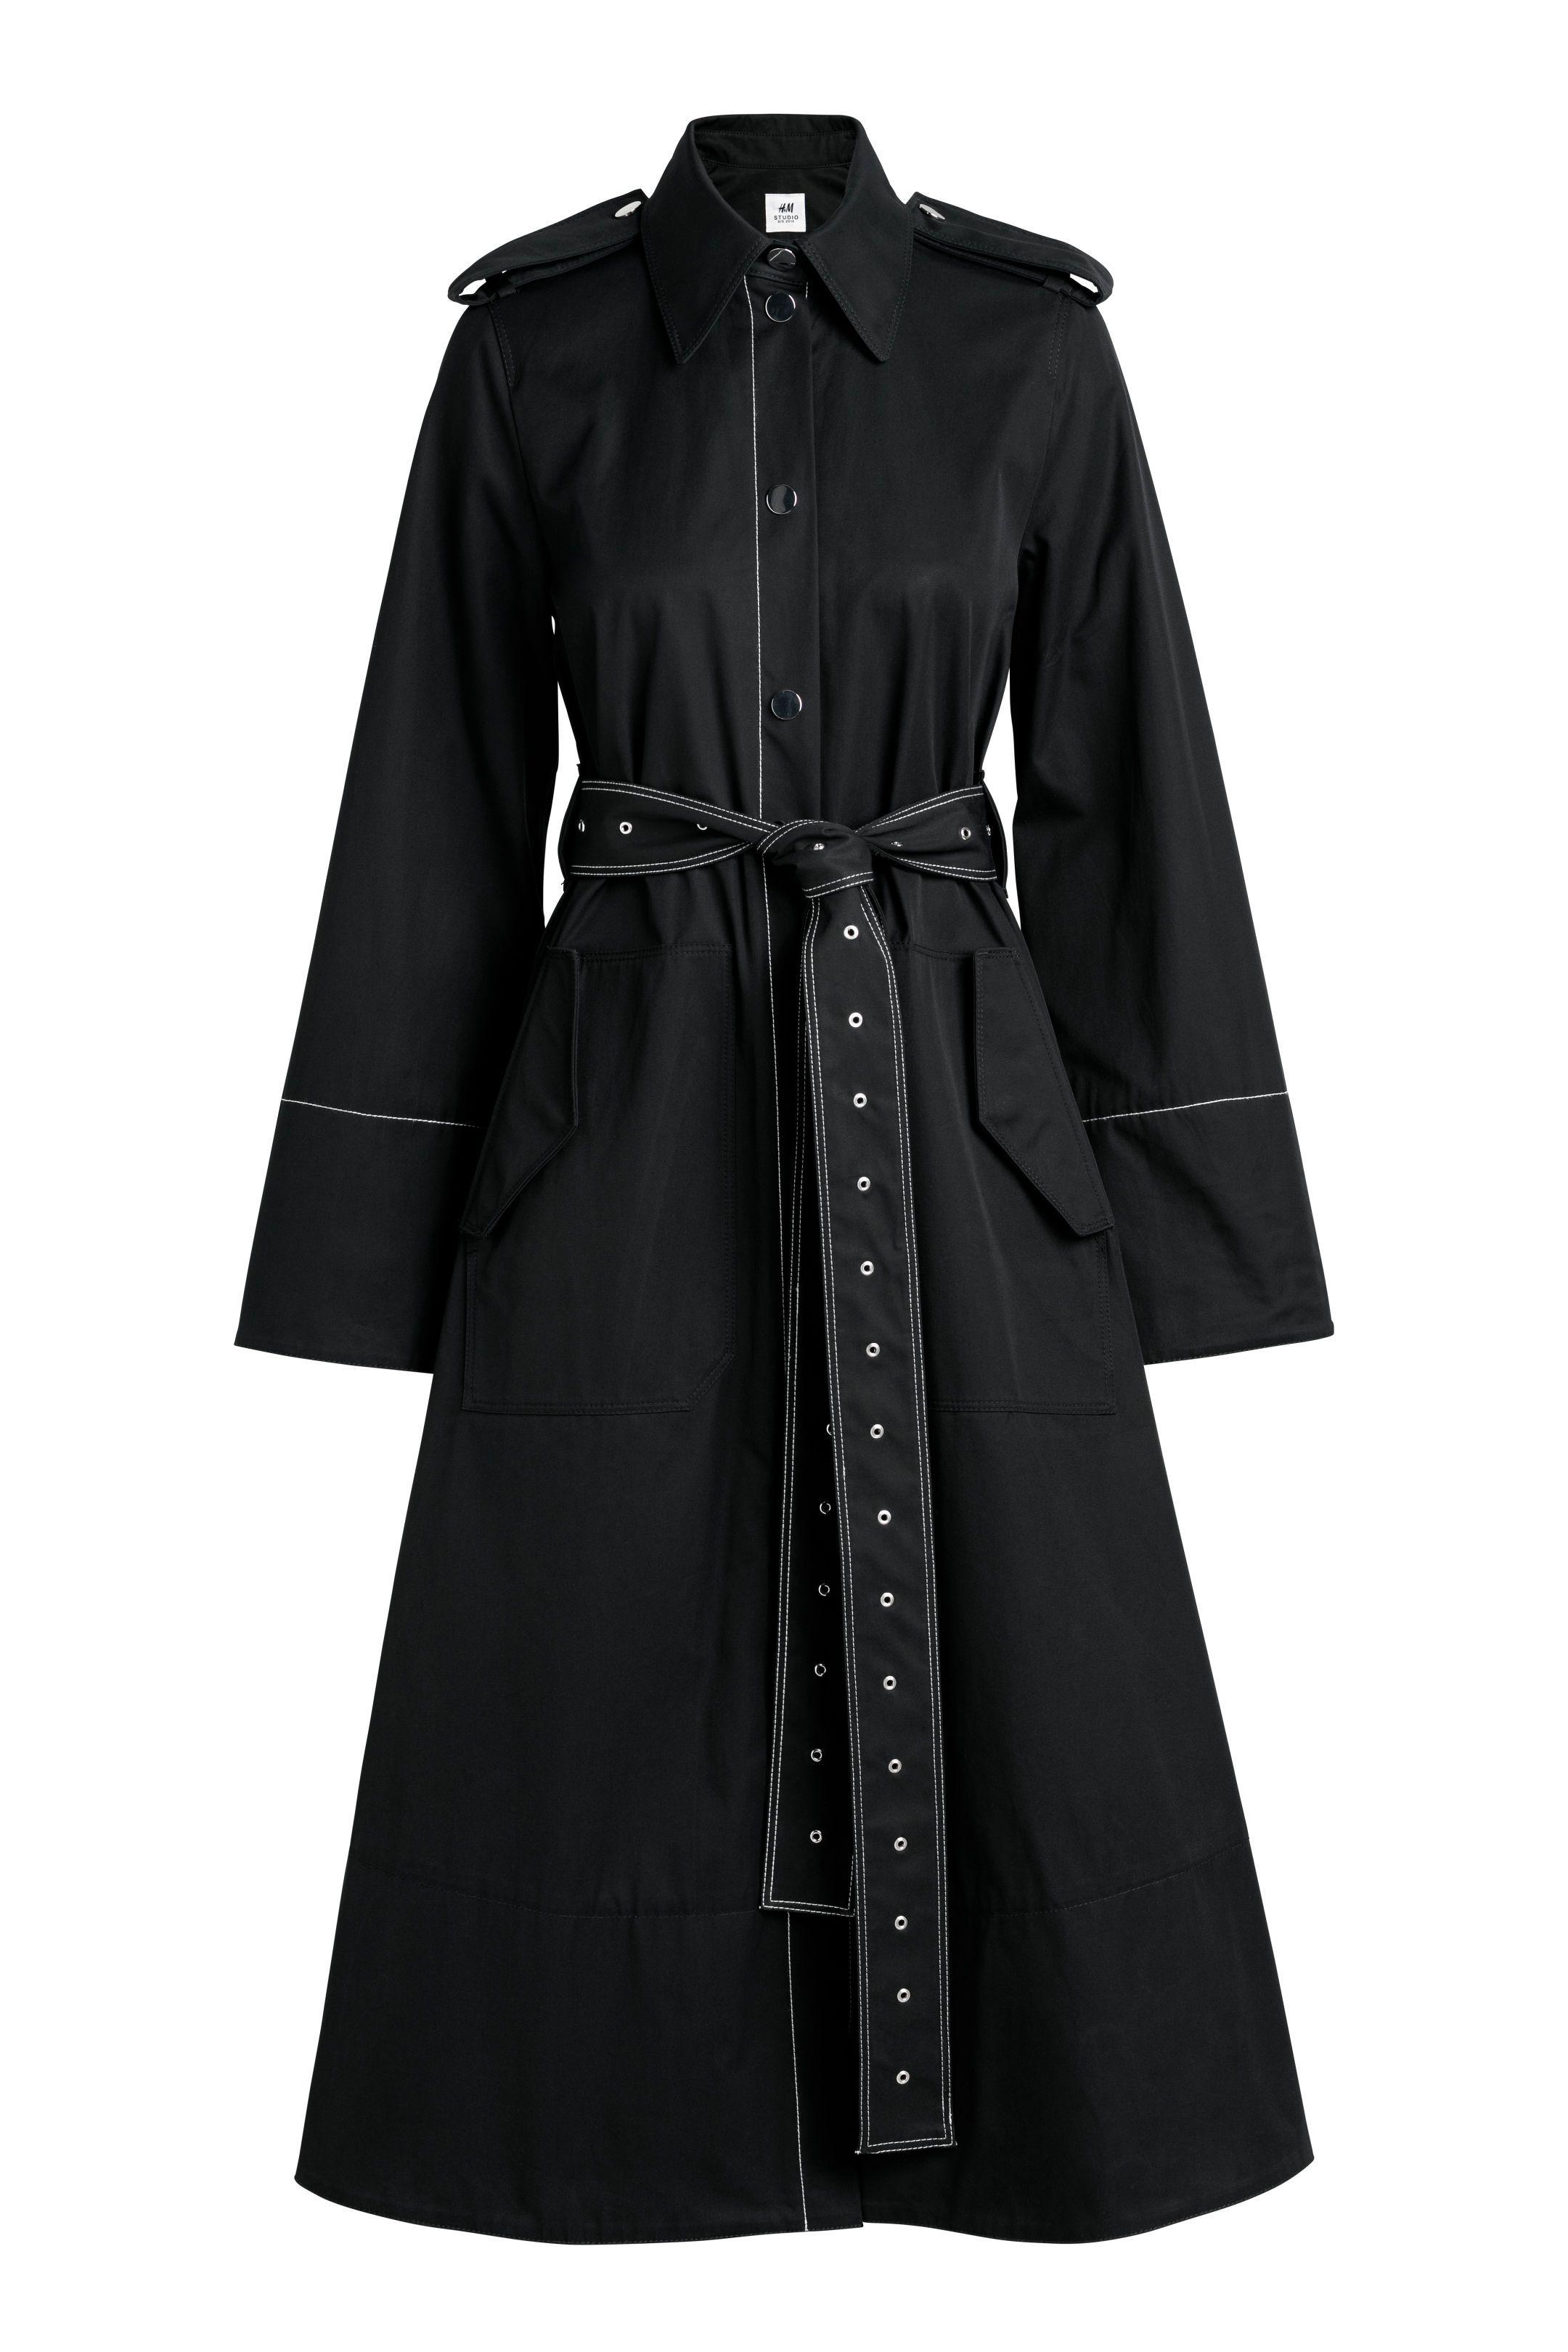 Ann taylor black trench coat sp small petite euc